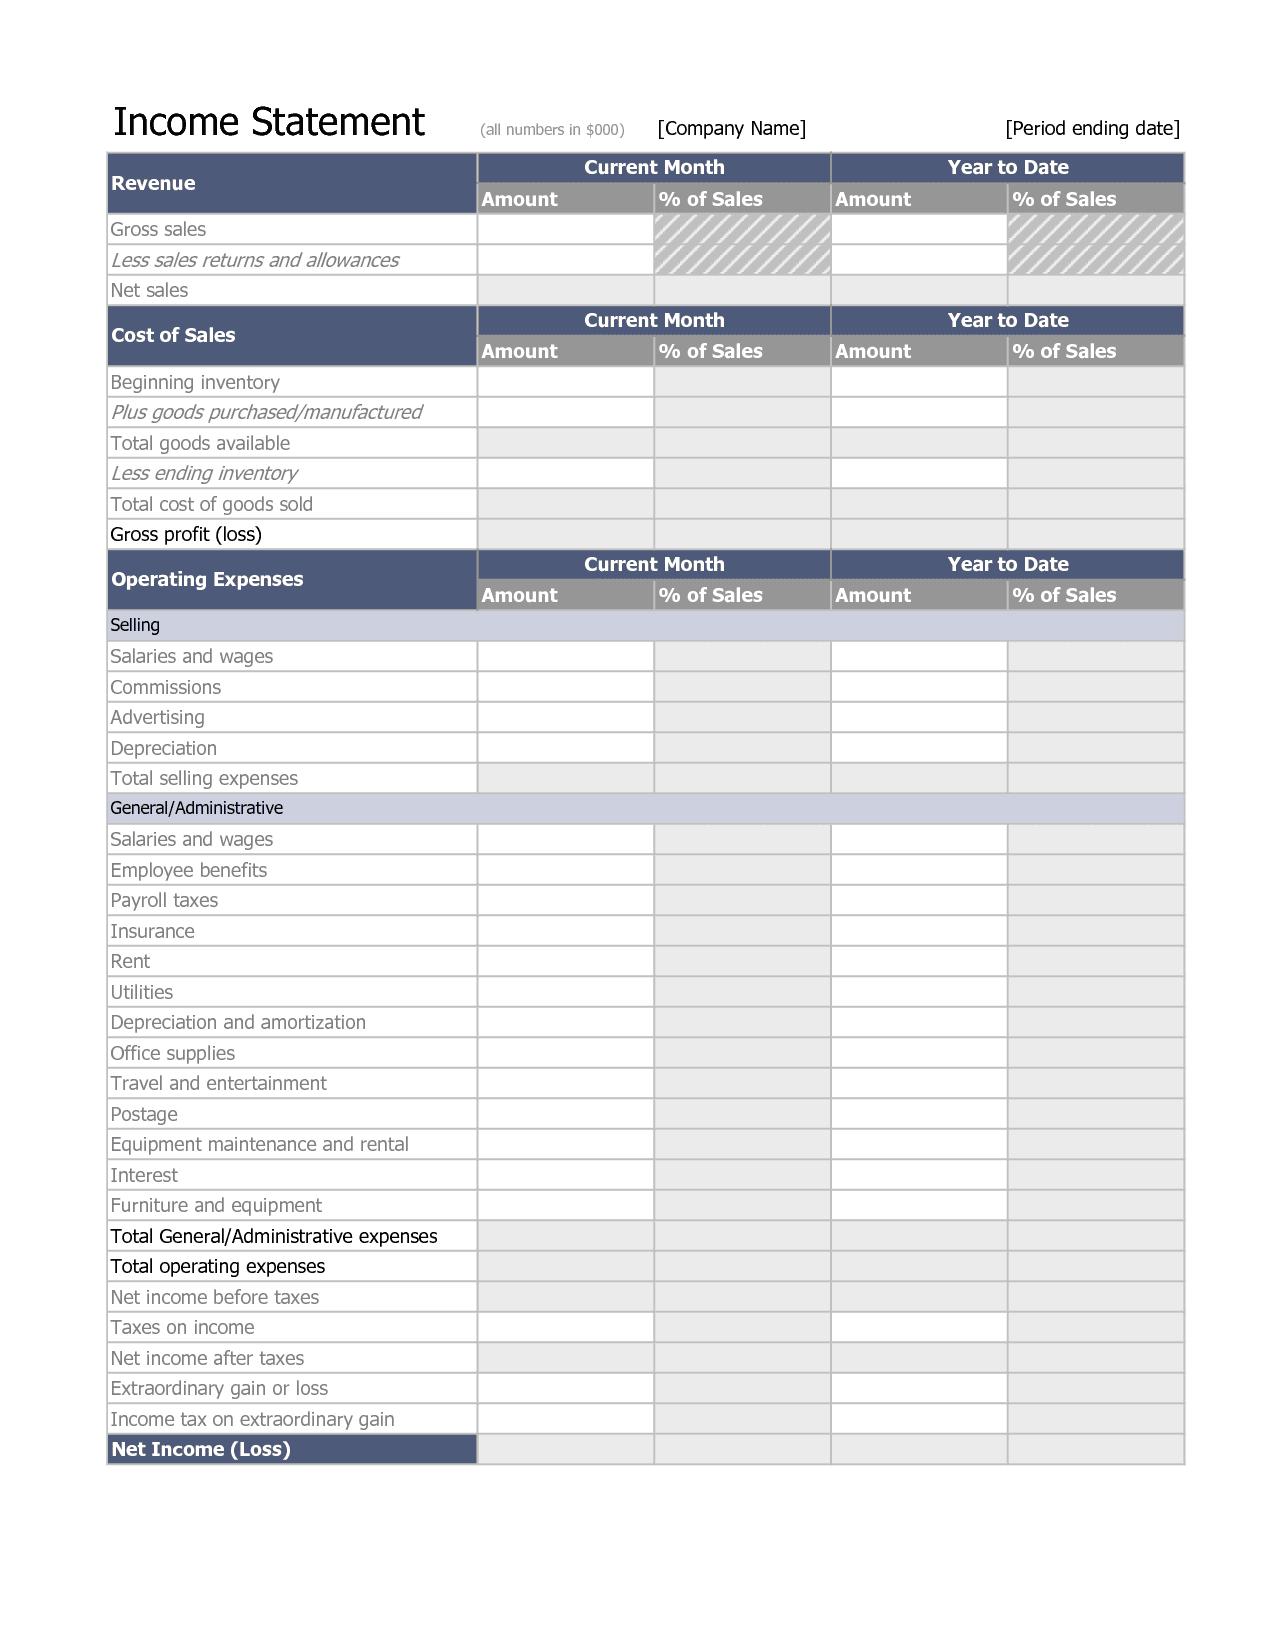 Income Statement Worksheet